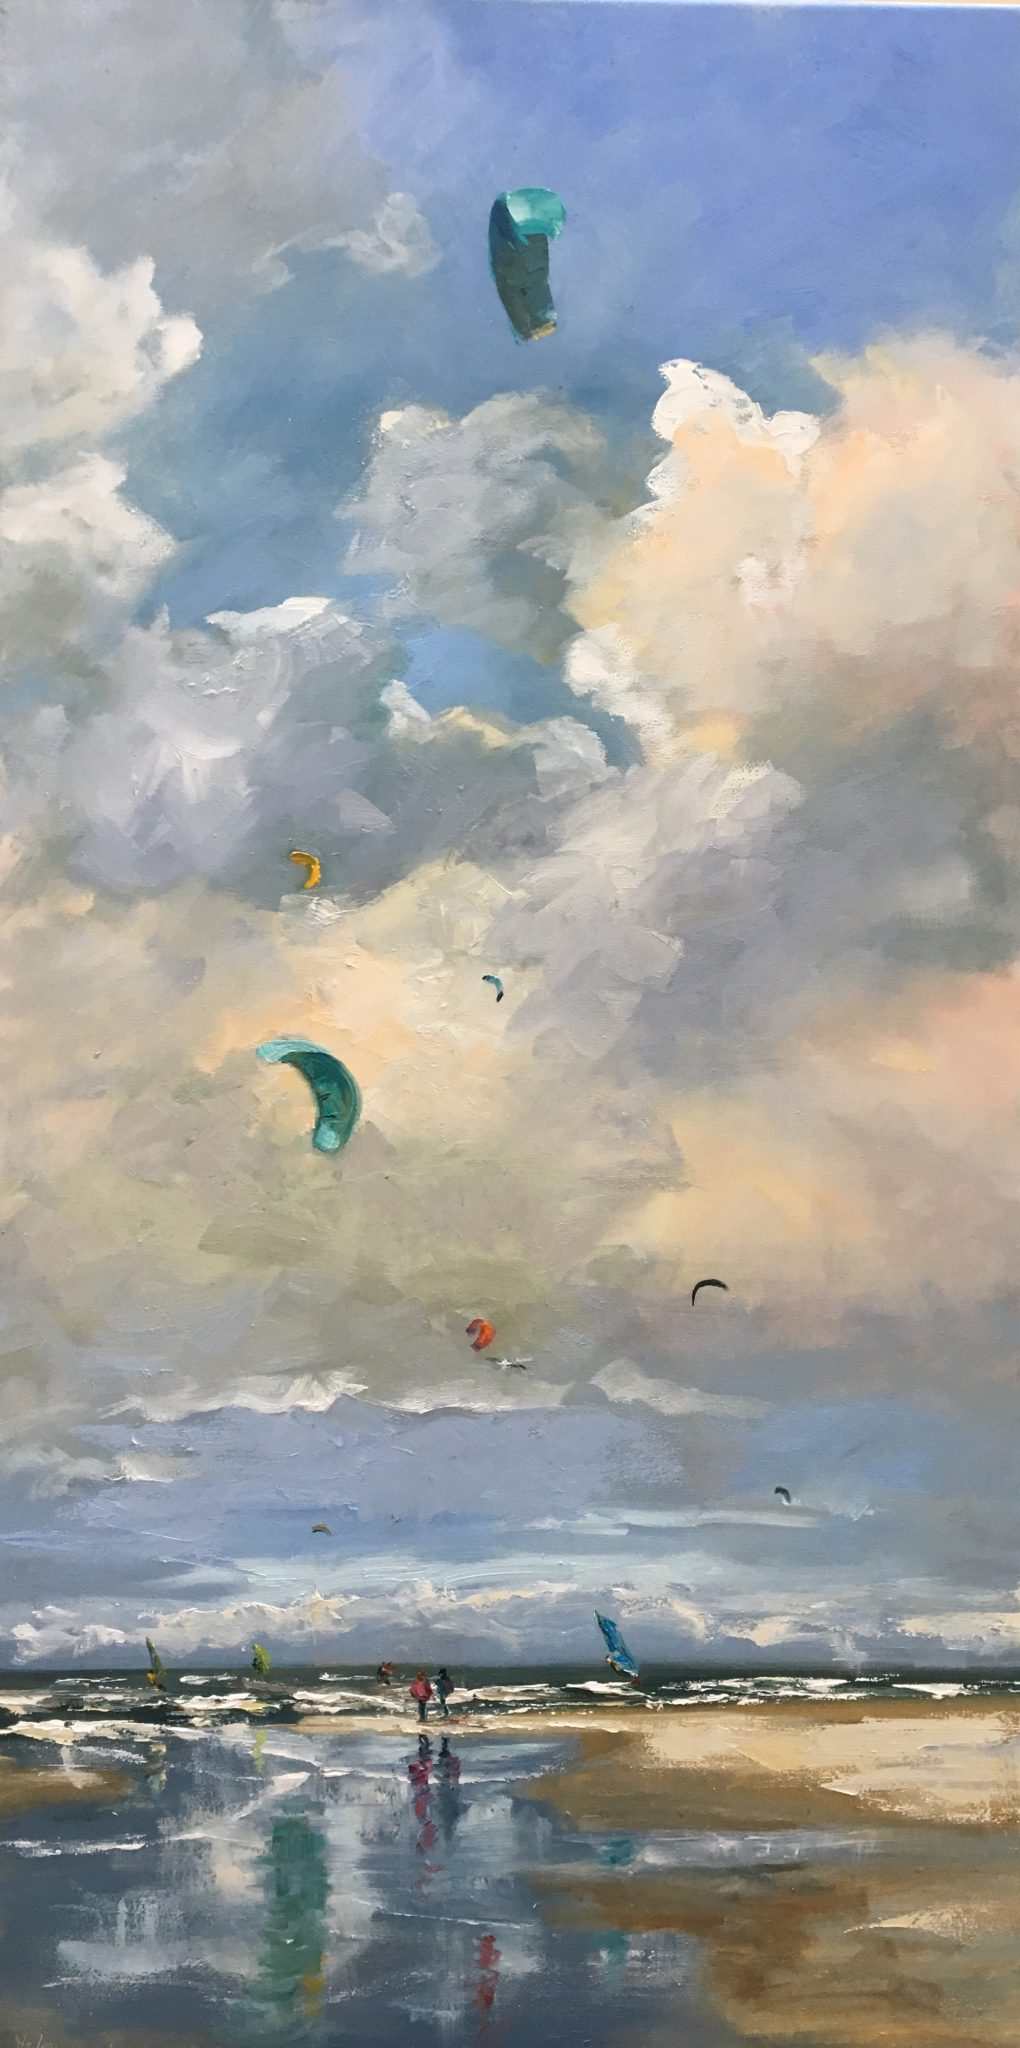 Kiters, surfers, clouds, seascape-zeegezicht-Lynden